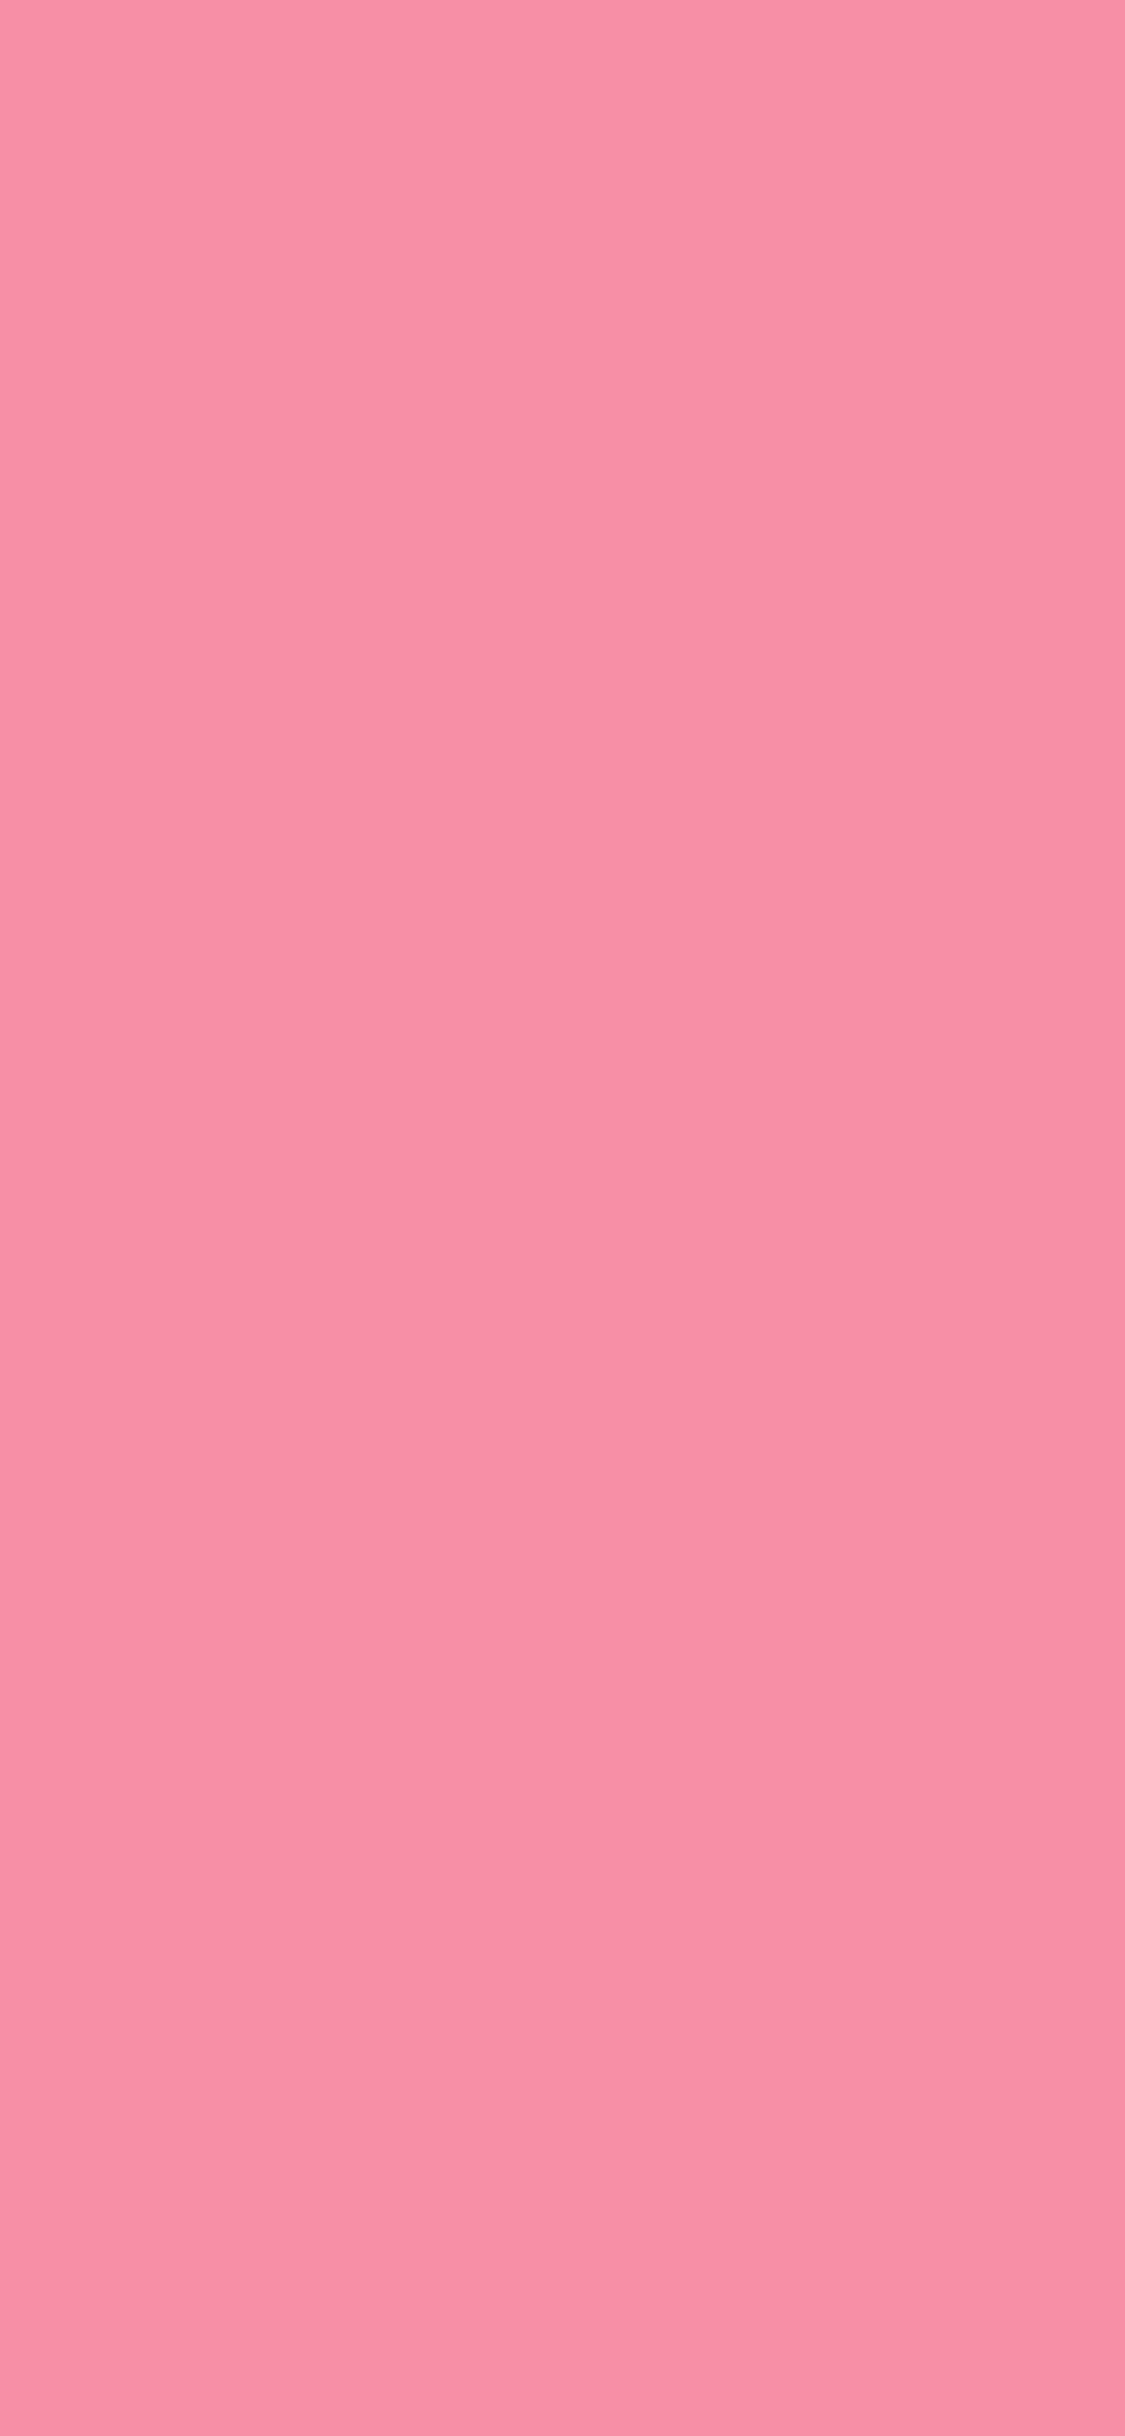 1125x2436 Pink Sherbet Solid Color Background